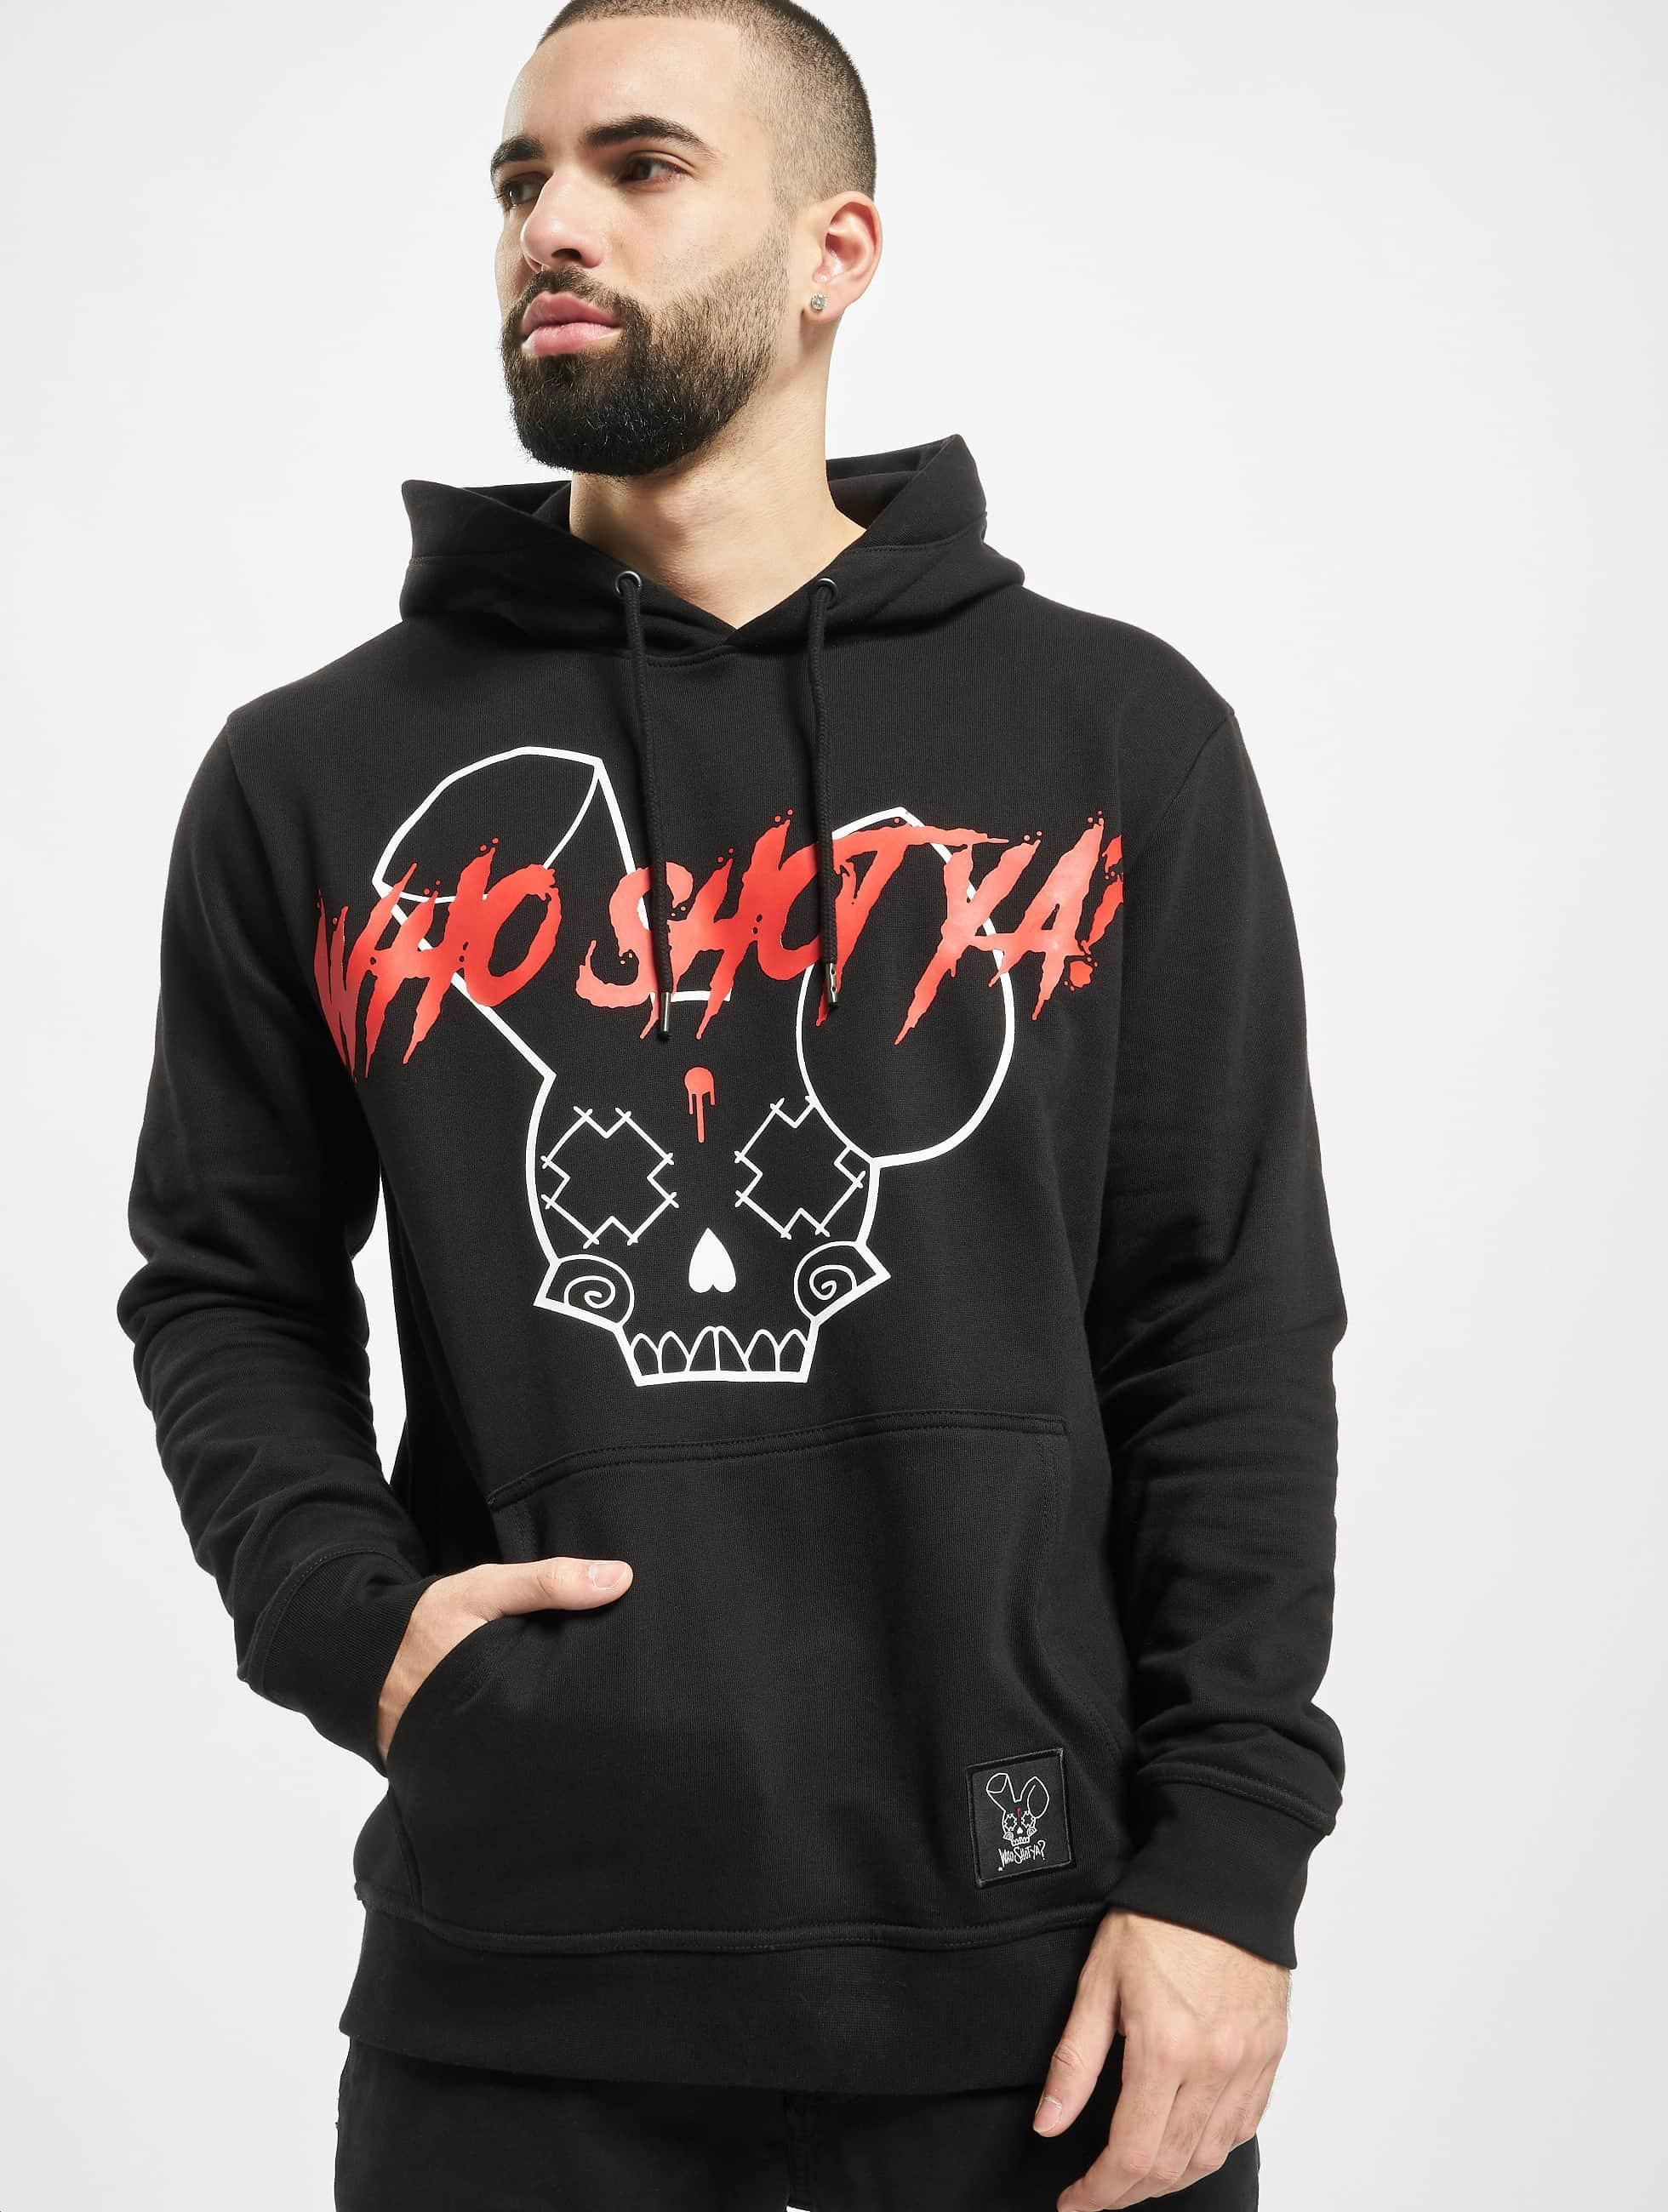 Who Shot Ya? / Hoodie Originals in black S